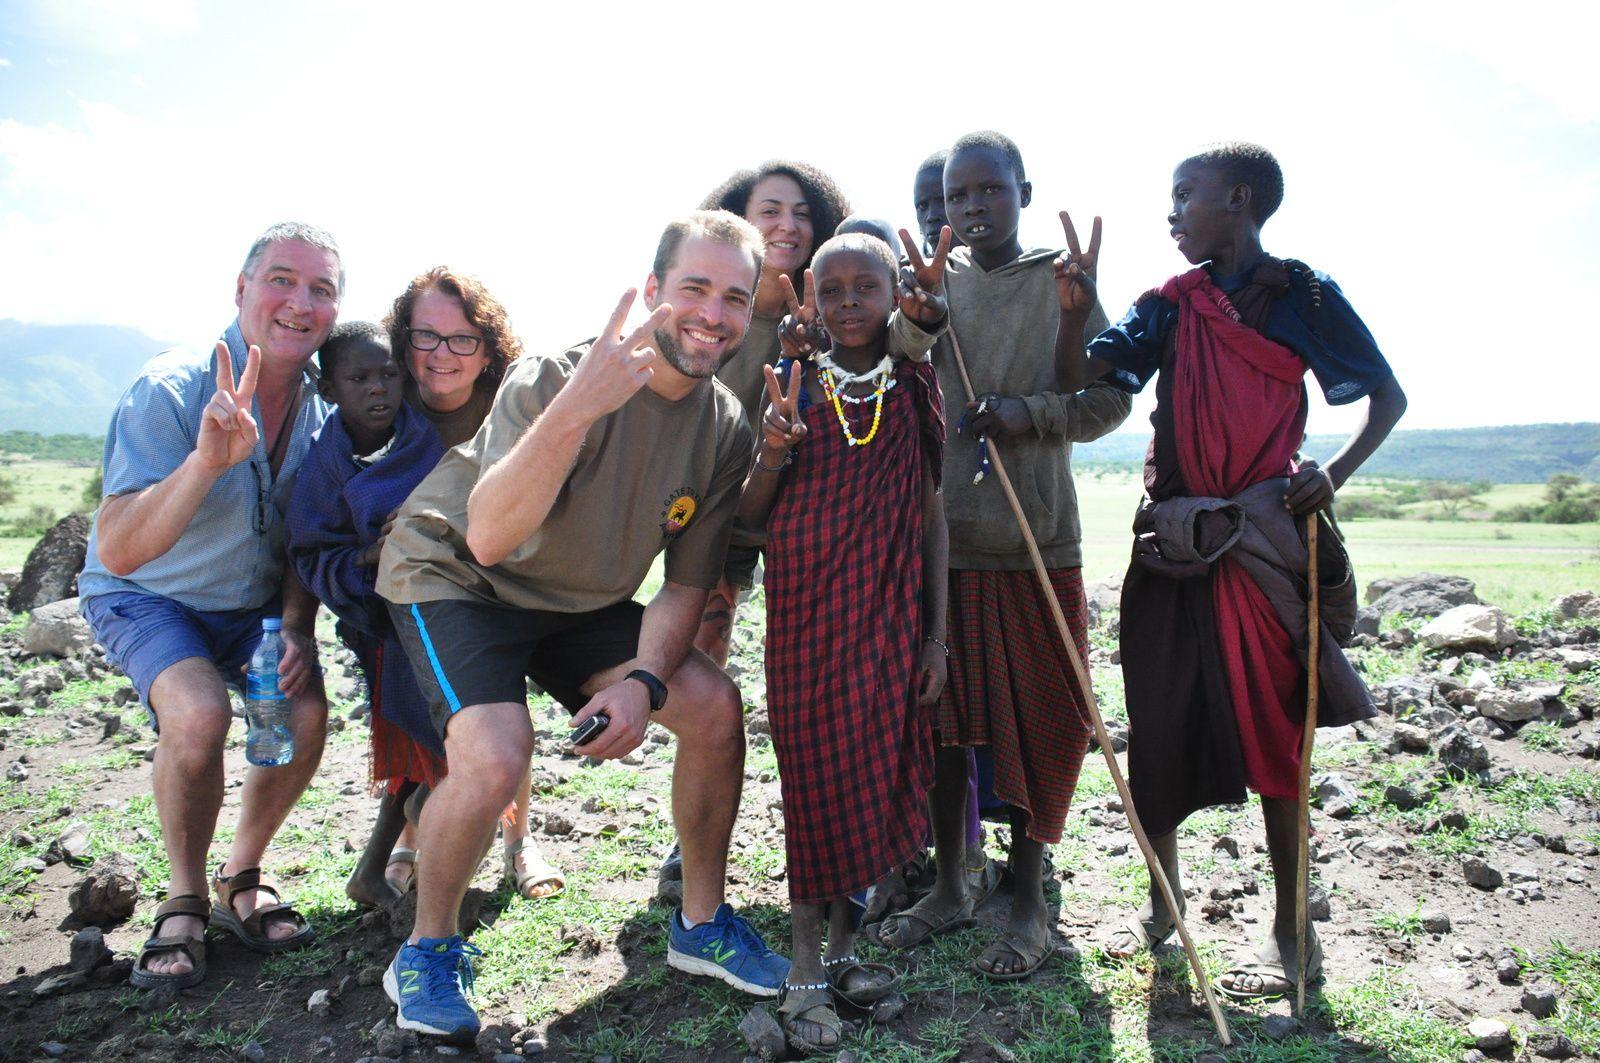 Asante sana Tanzania, Kwaheri Africa